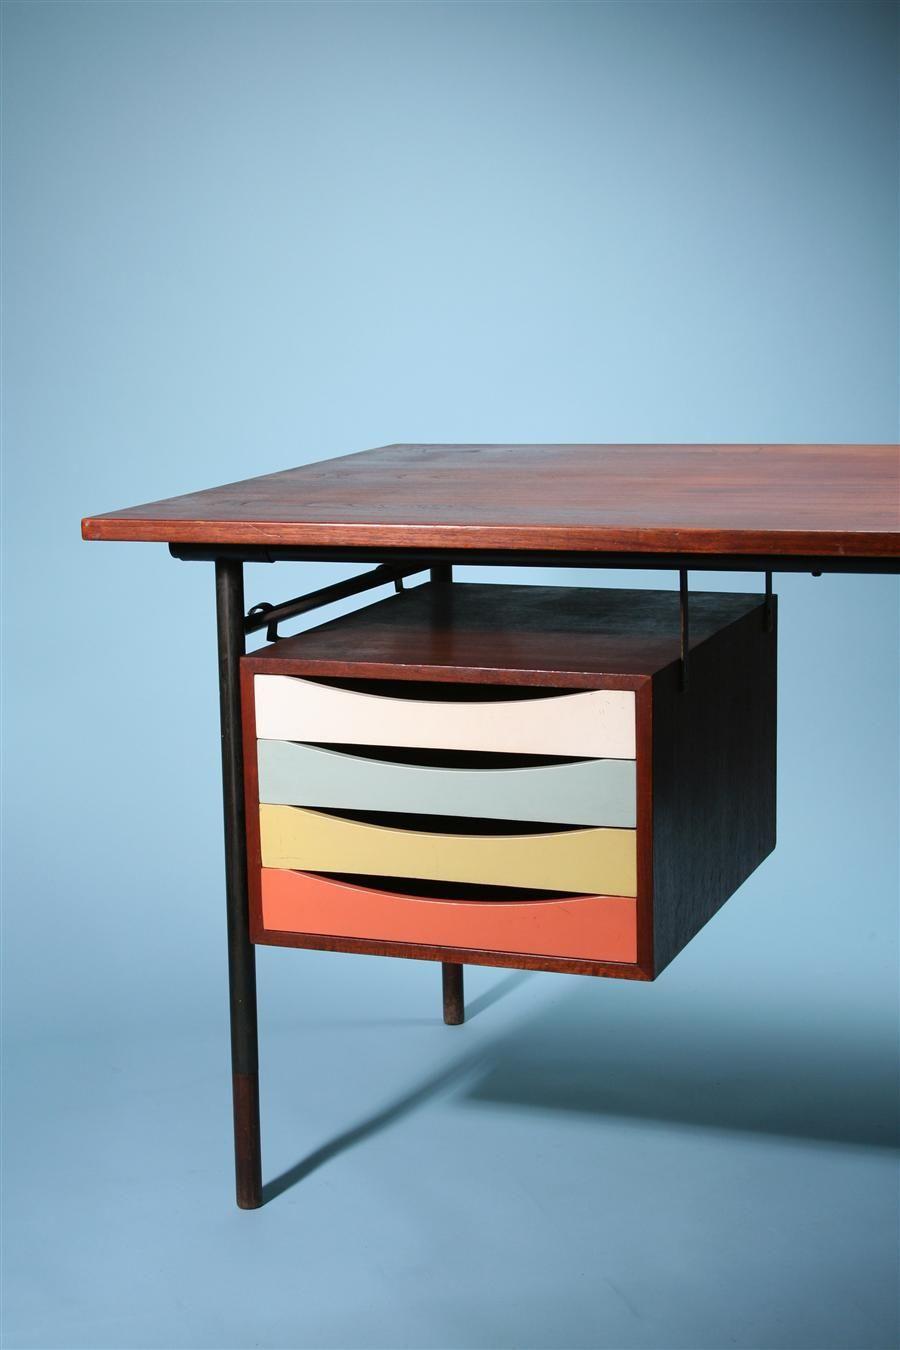 Mid Century Danish Furniture Designer Finn Juhl     I want this  organization all. Mid Century Danish Furniture Designer Finn Juhl     I want this